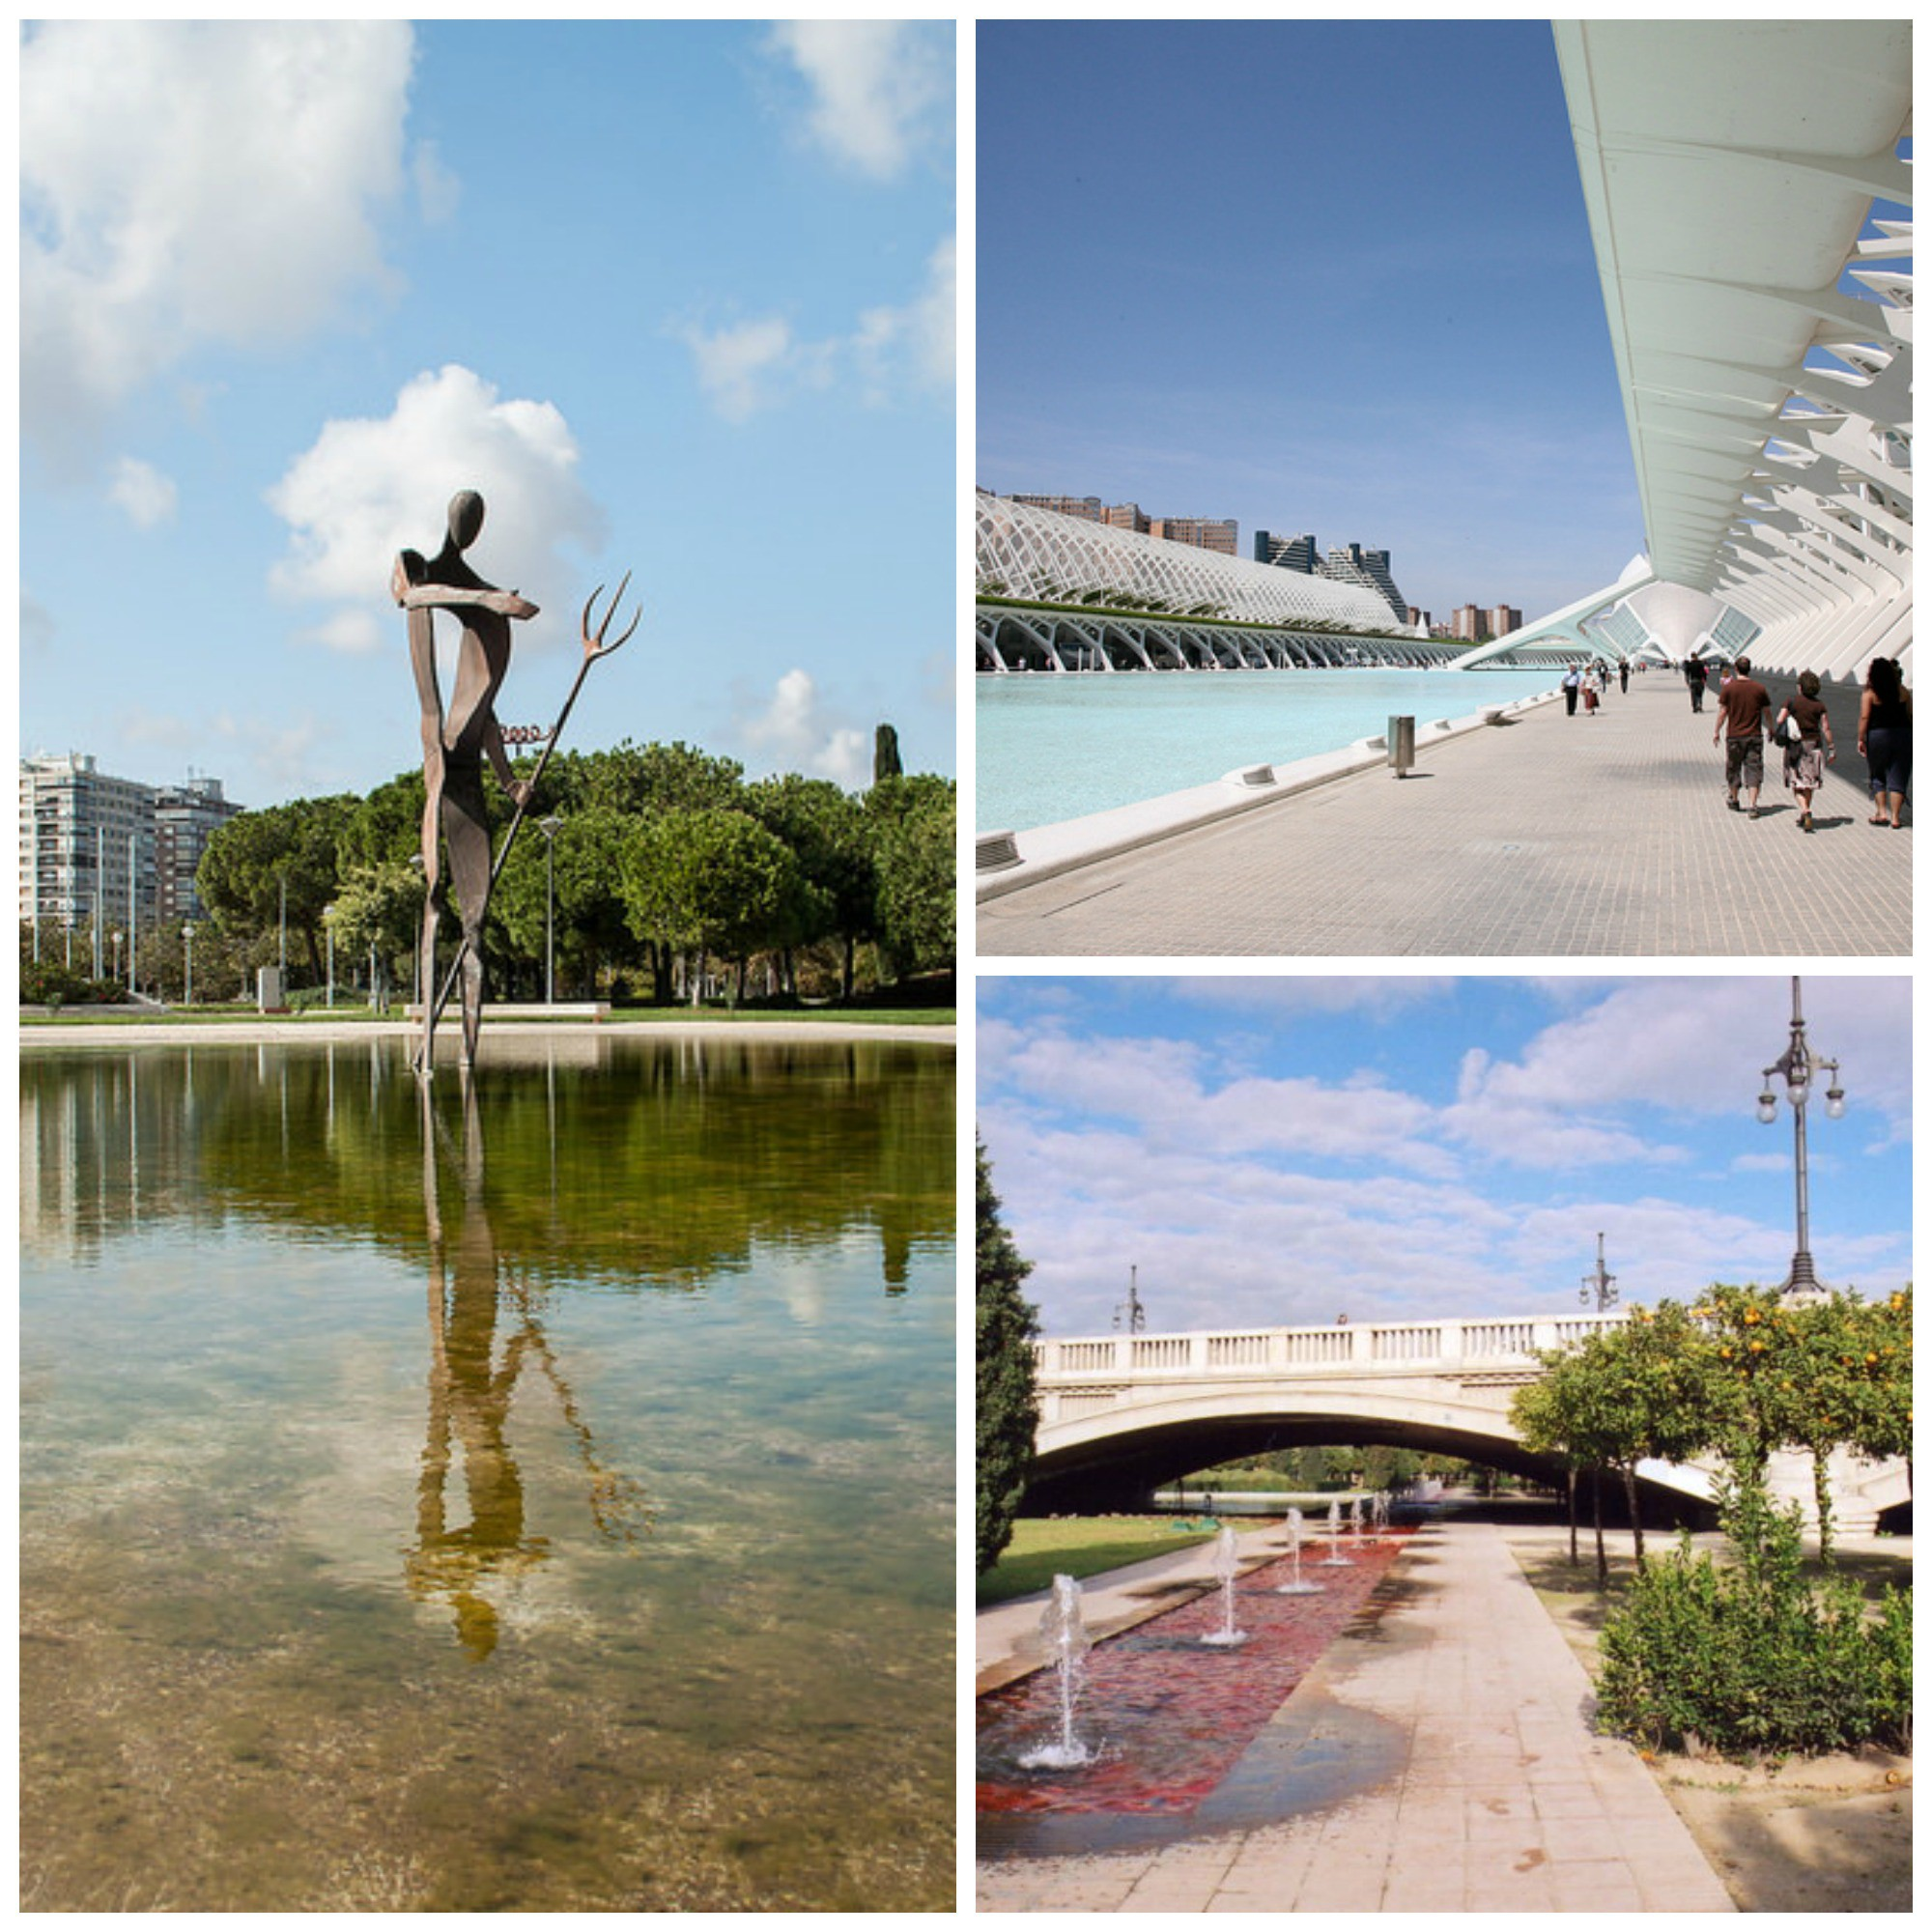 The History Of The Valencian Jardin Del Turia In 1 Minute